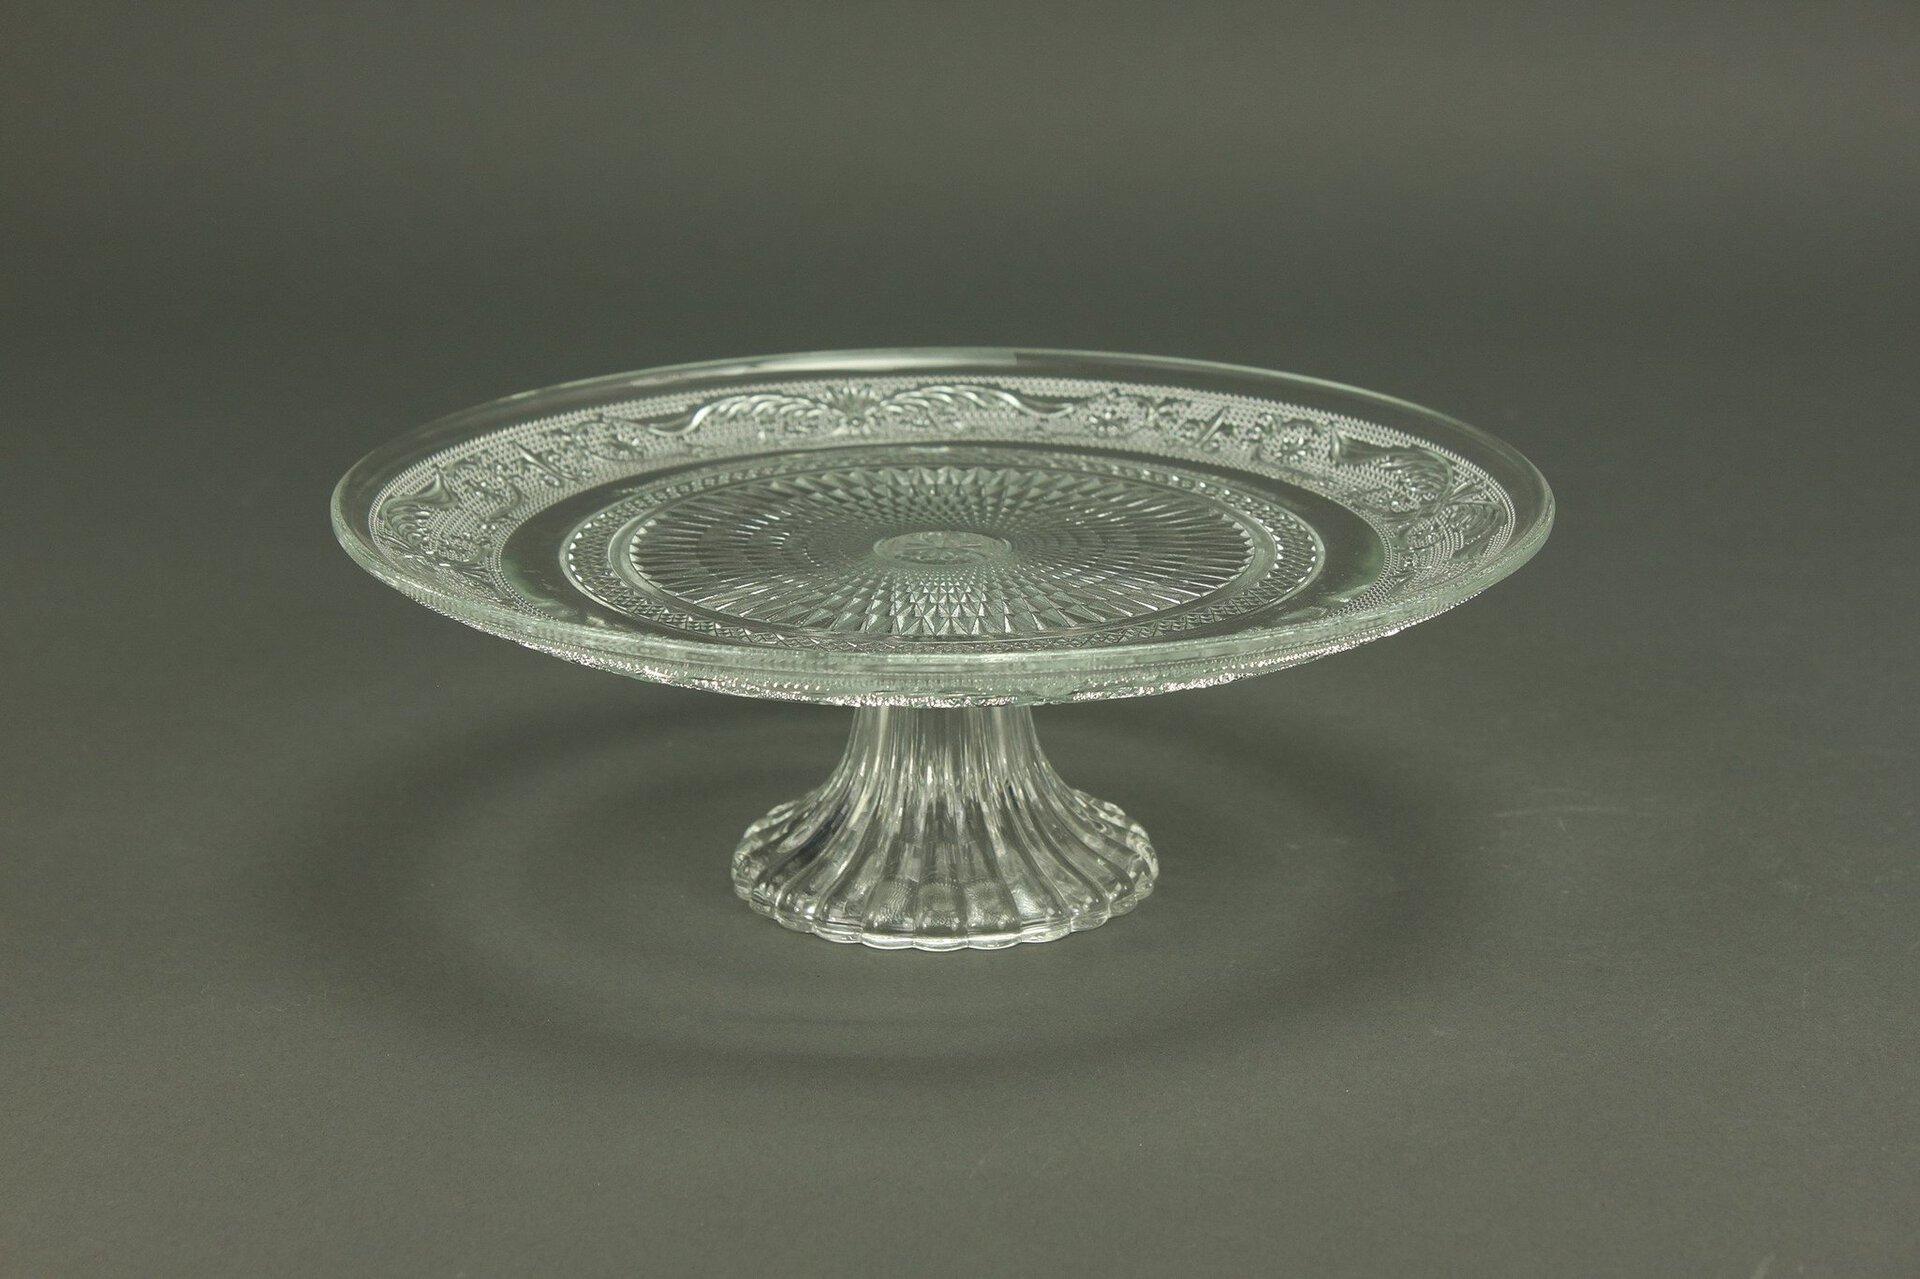 Dekorationsartikel Werner Voß Glas